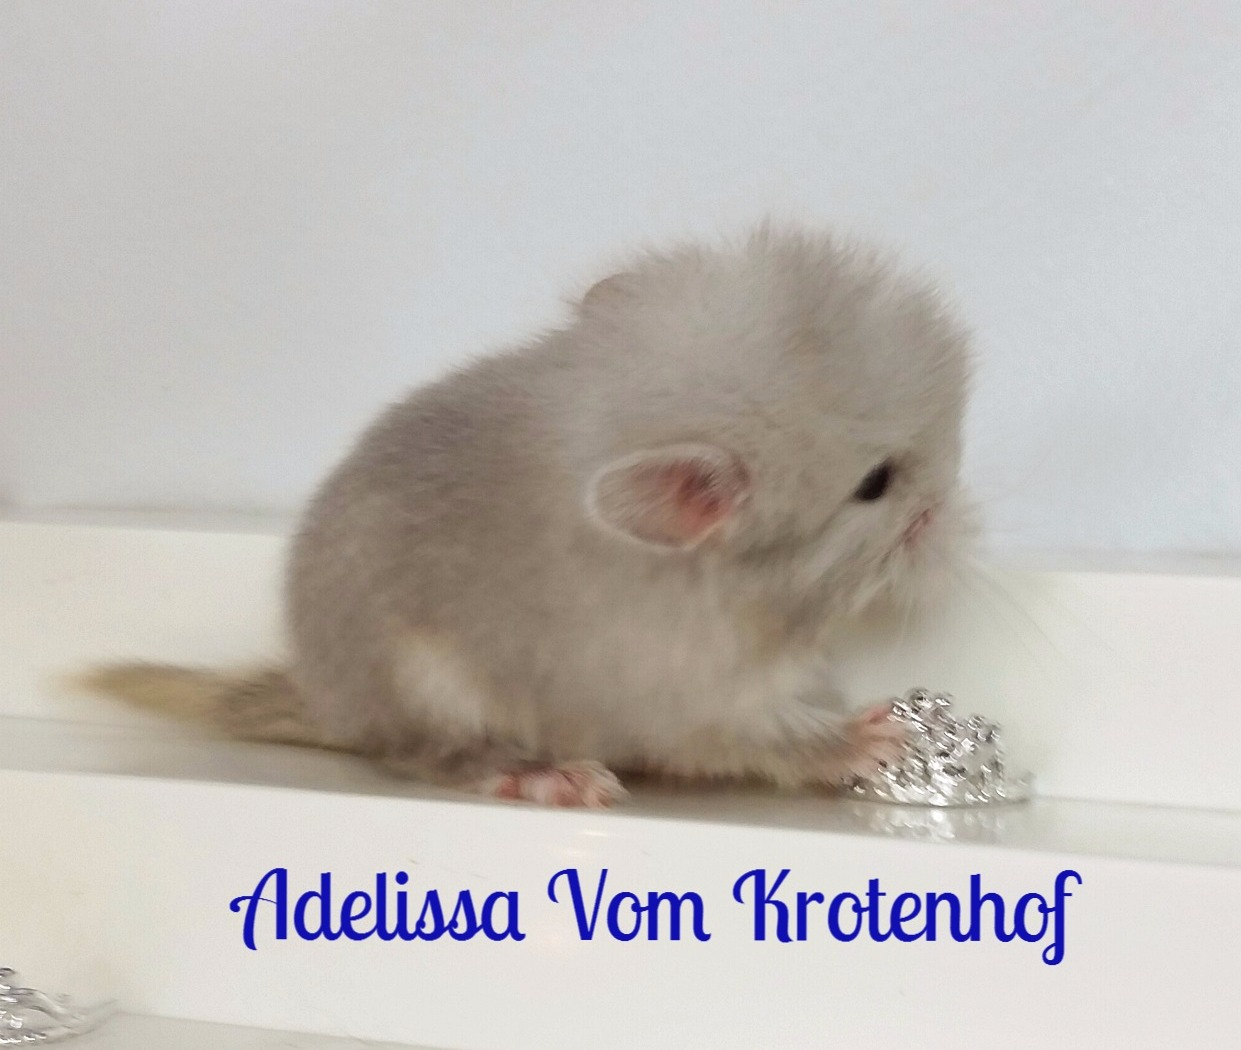 Princess Adelissa